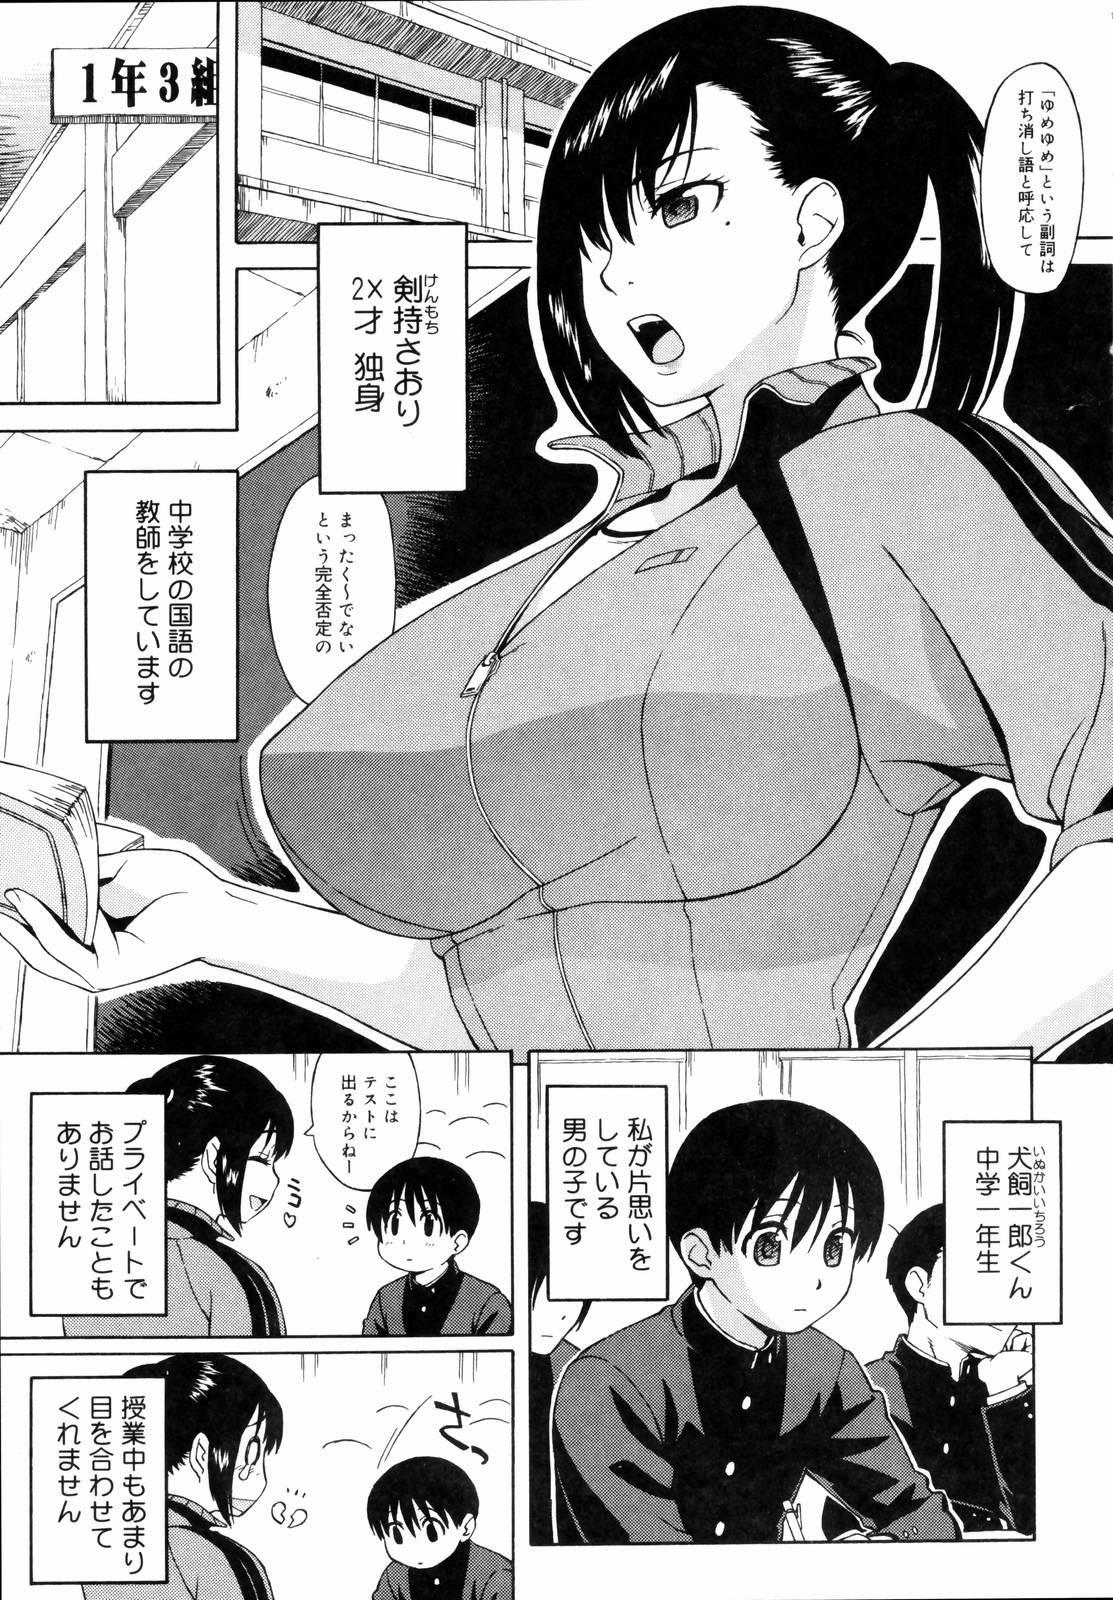 Shishunki wa Hatsujouki - Adolescence is a sexual excitement period. 108